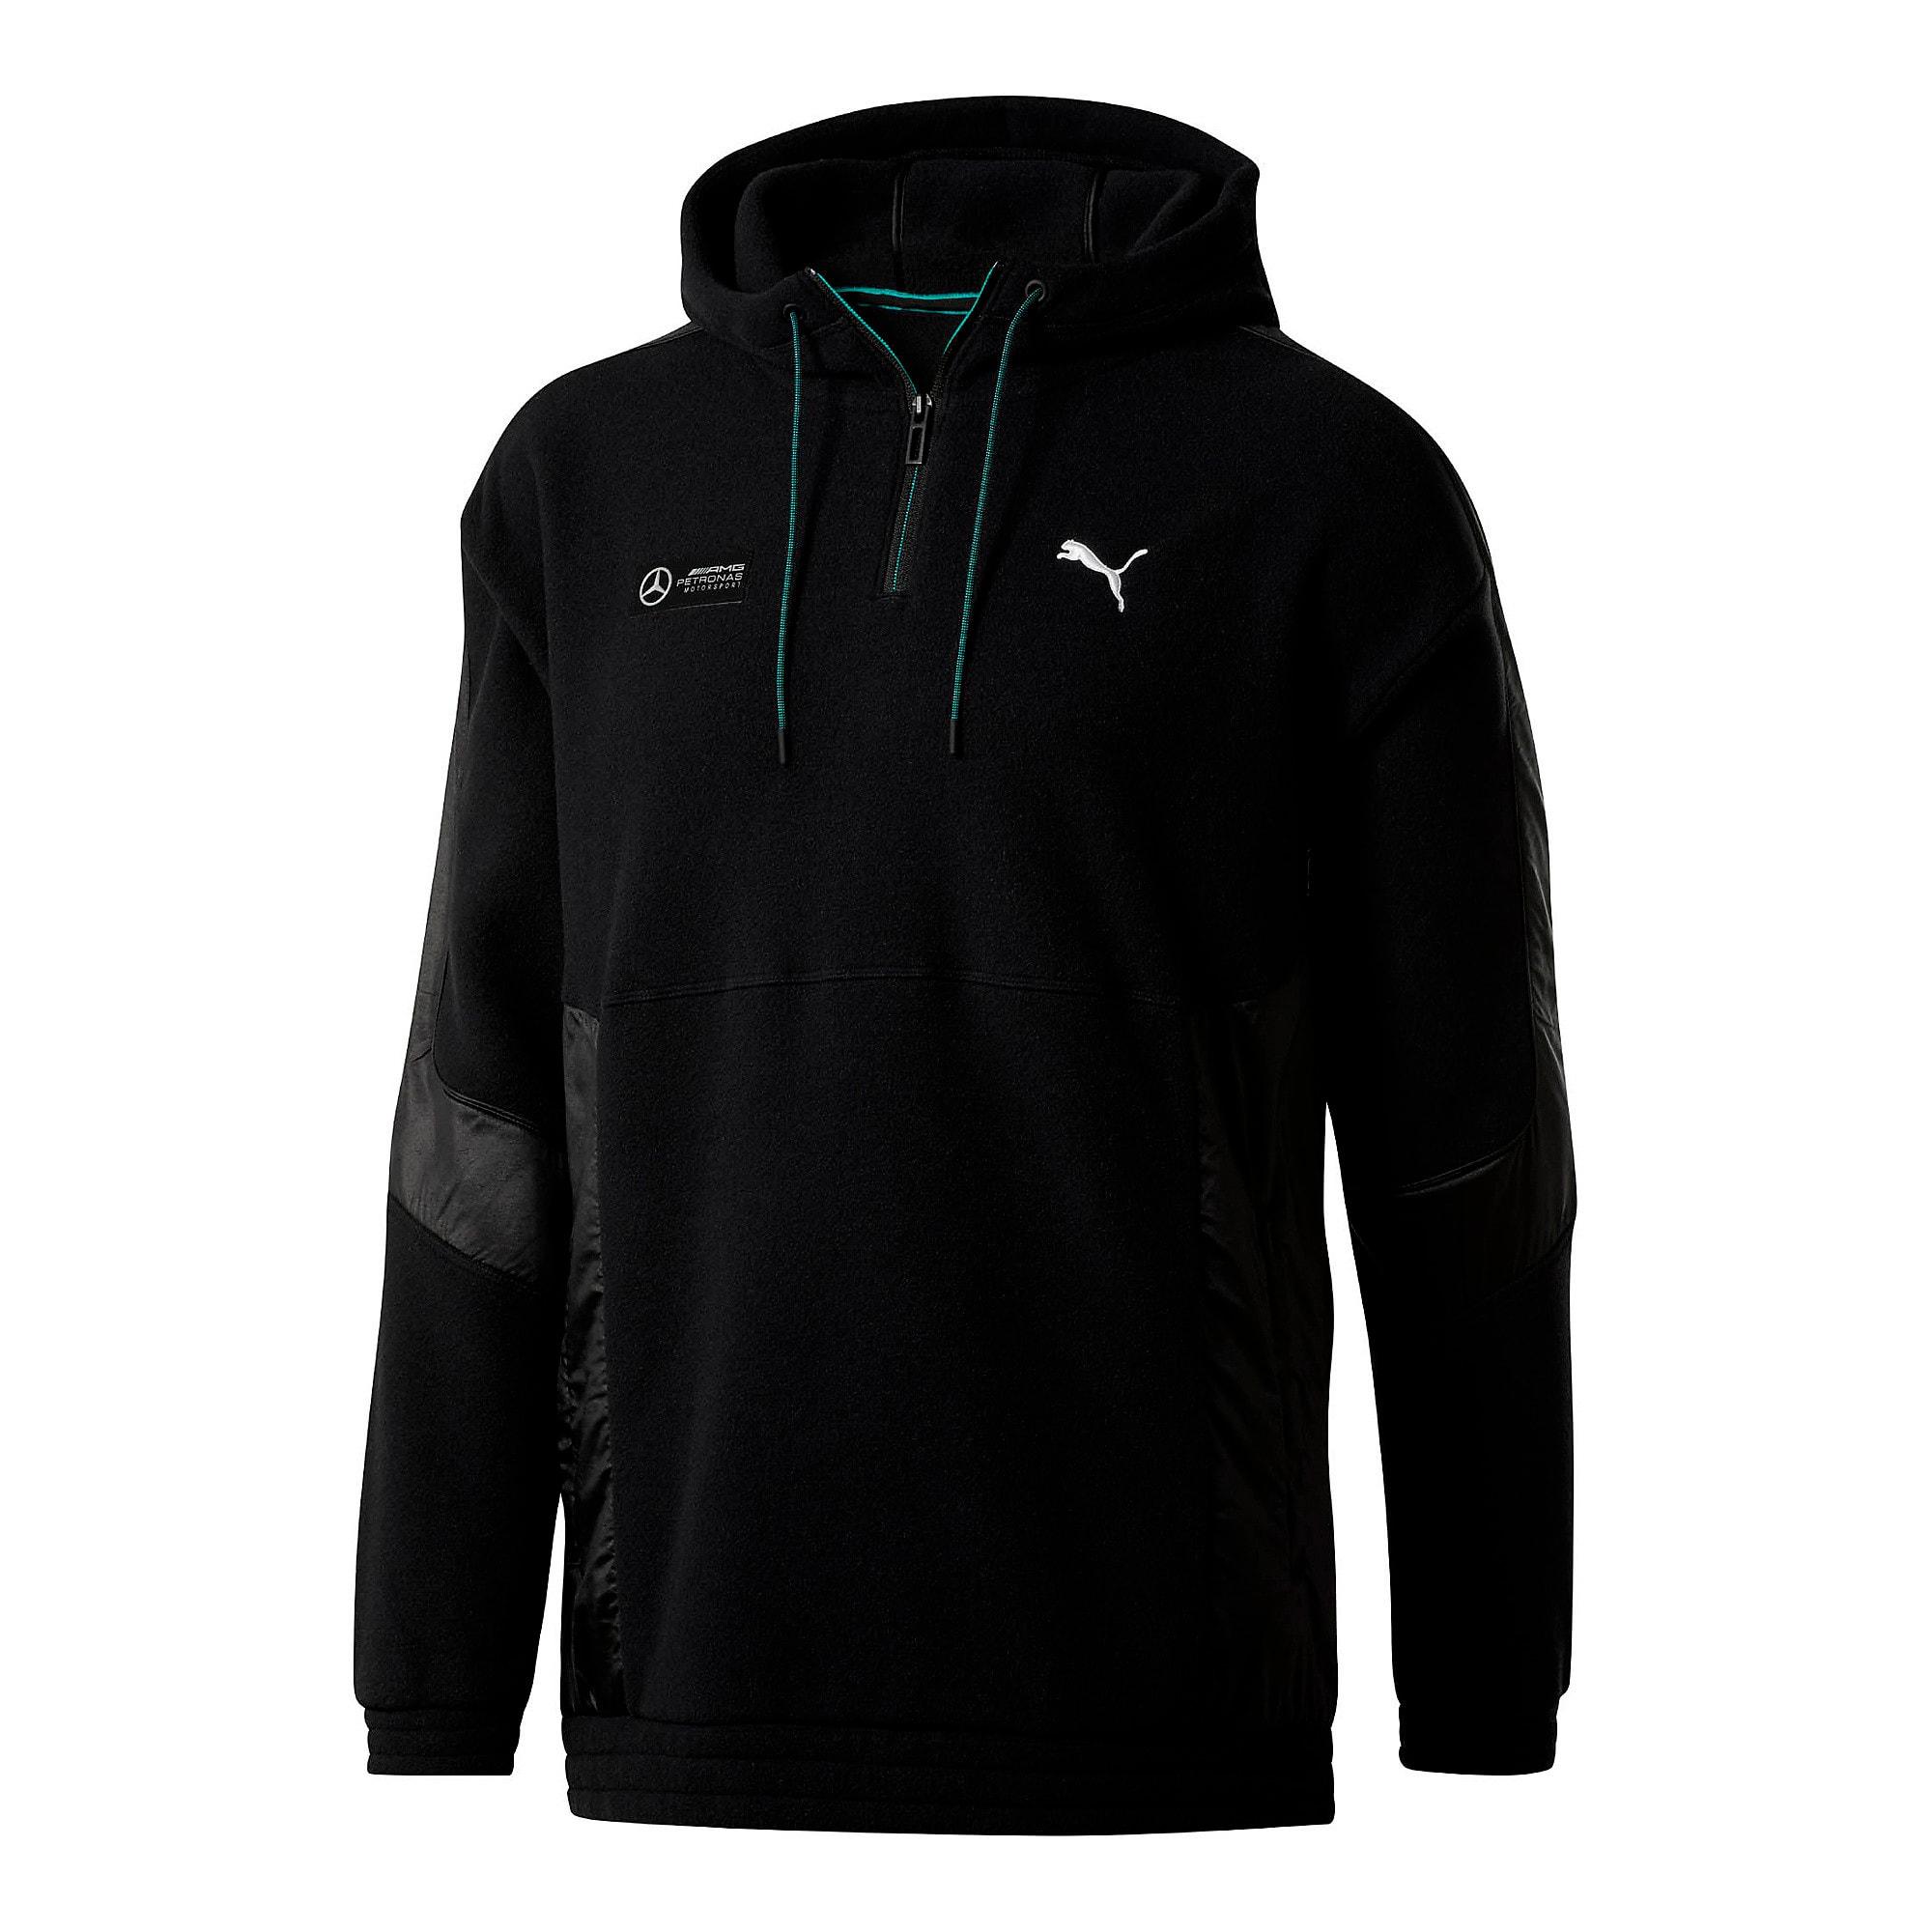 Thumbnail 1 of Mercedes AMG Petronas RCT Tech Fleece Men's Pullover, Puma Black, medium